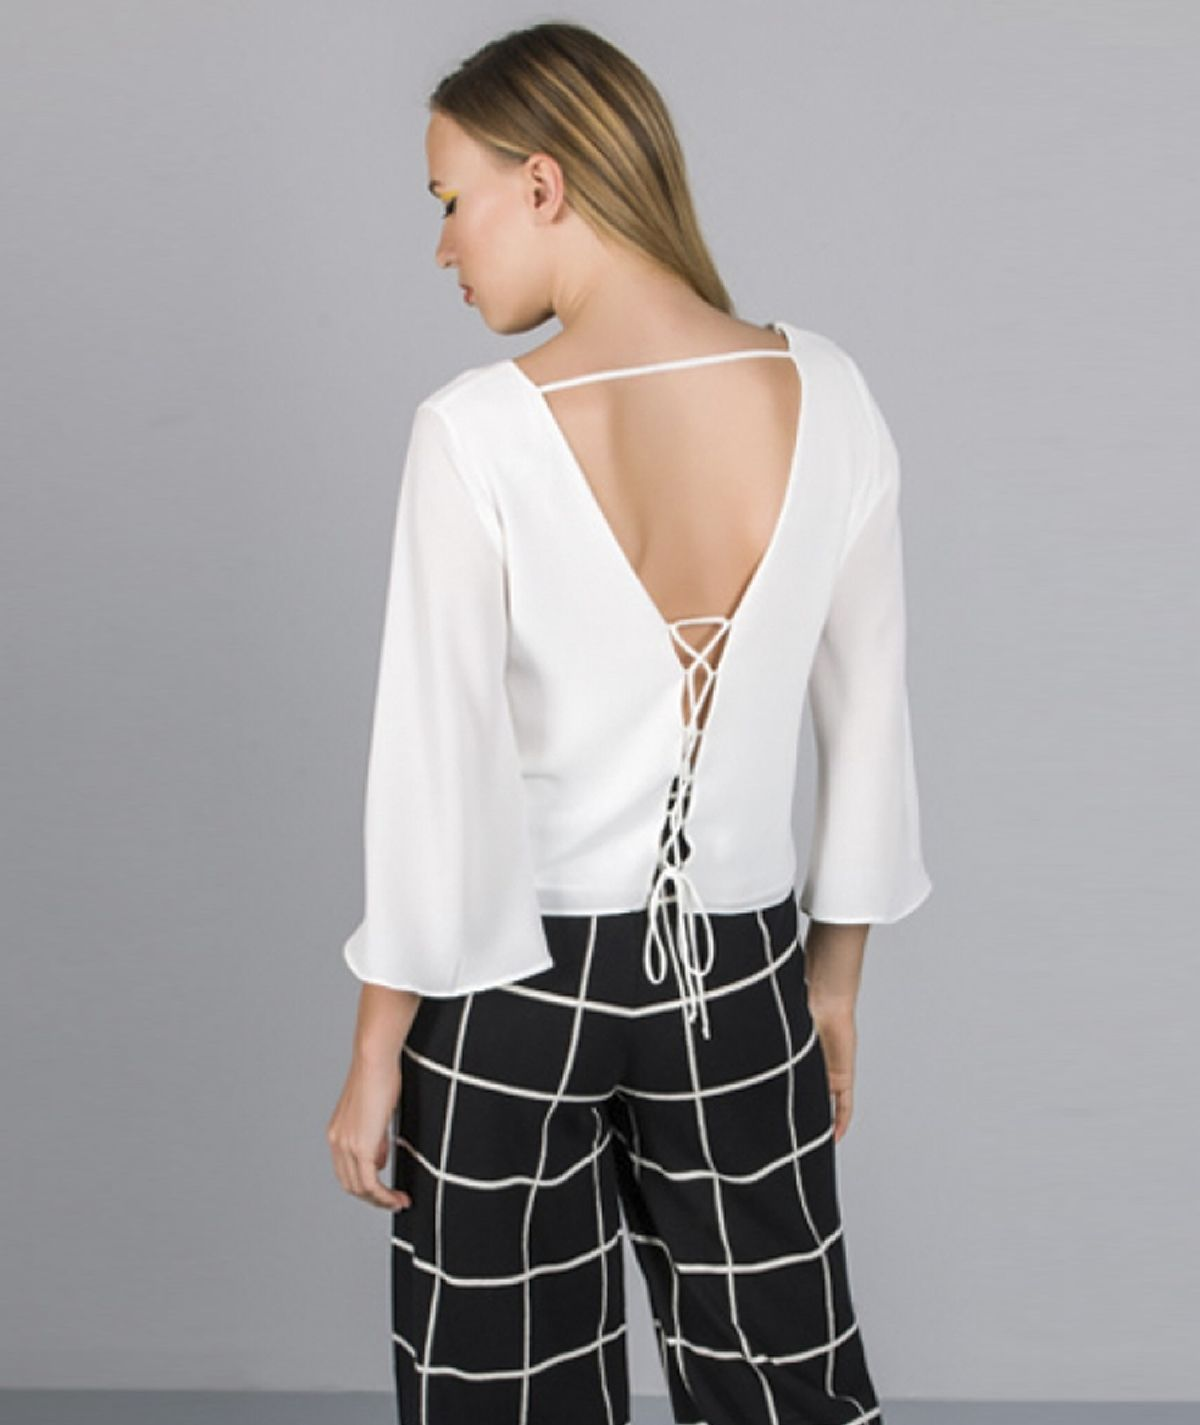 [CHIESSY] Blusa decote em V